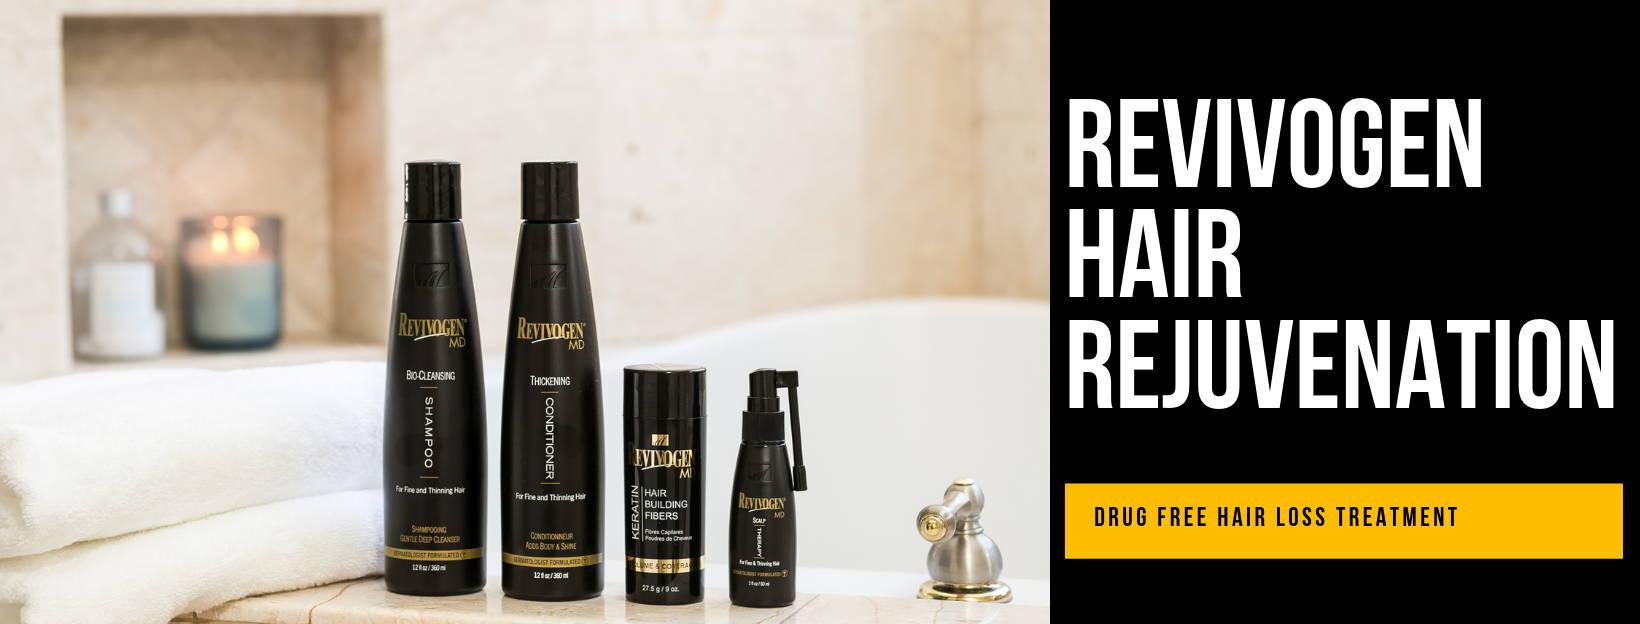 Revivogen Hair Loss Treatment